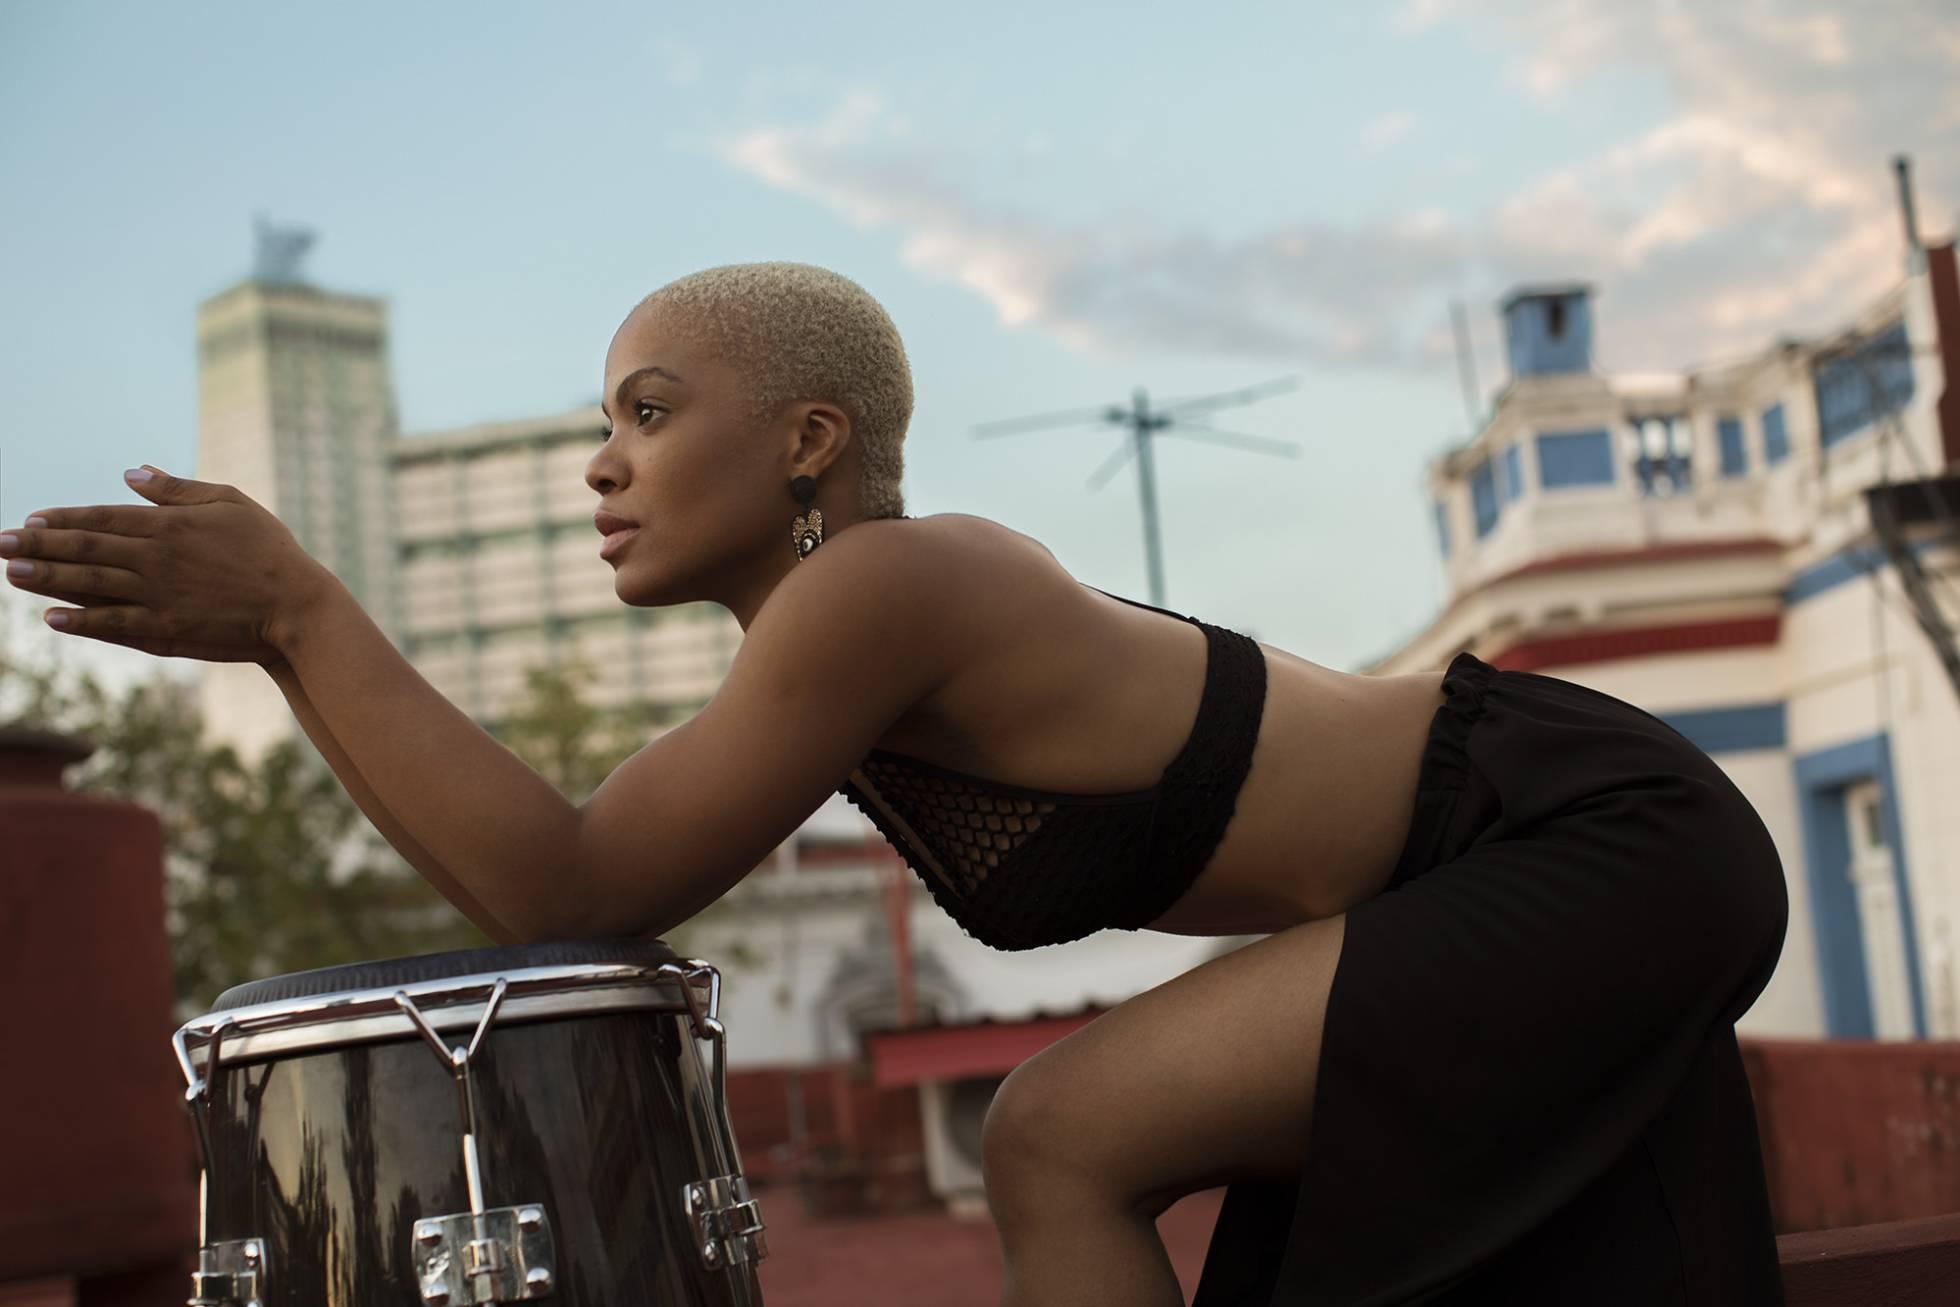 THE NEW CUBAN MUSIC